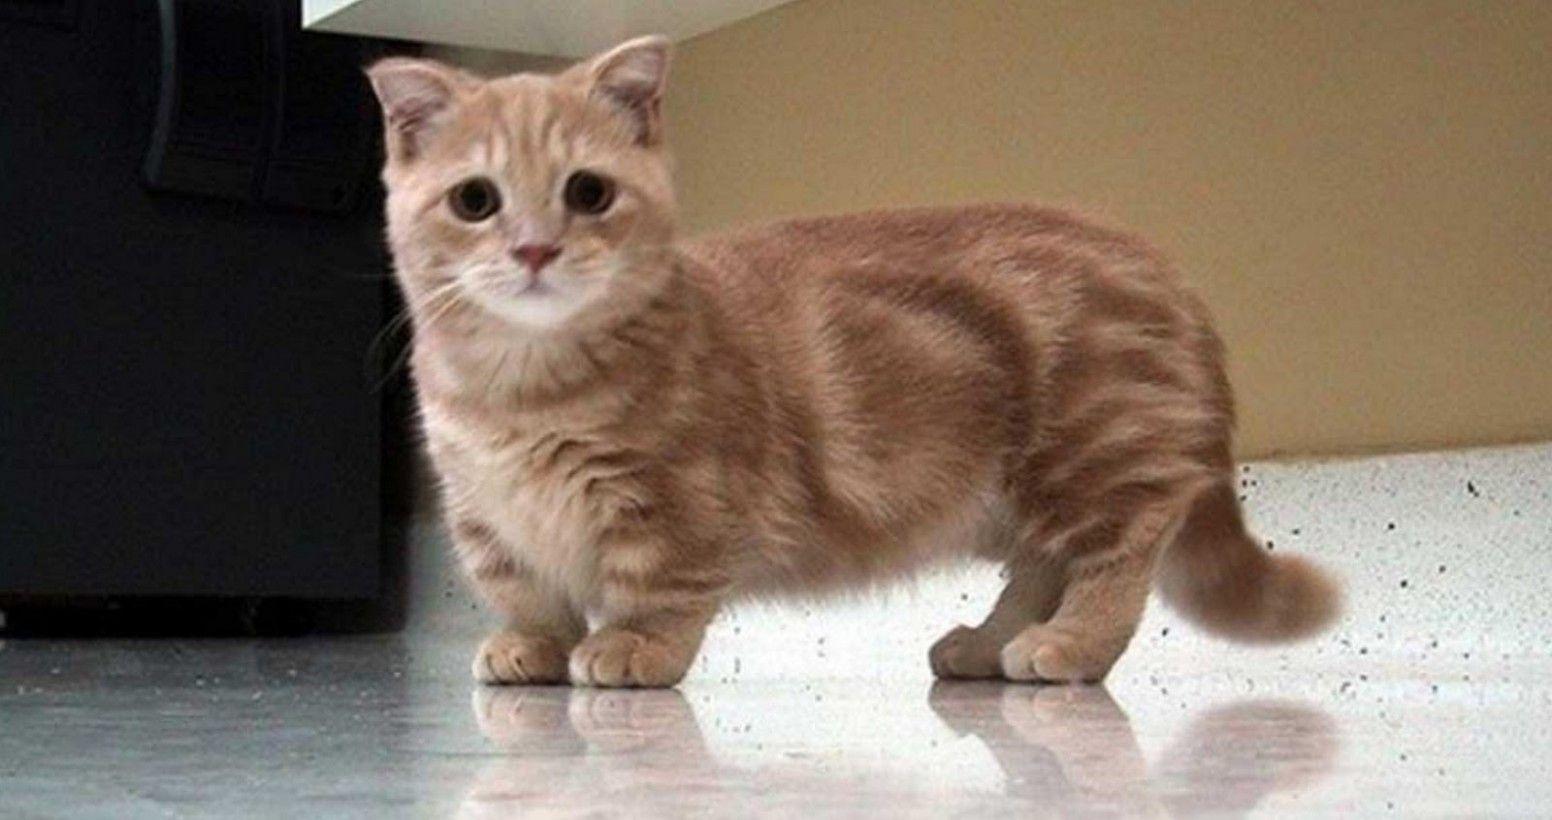 9 Short Legged Munchkin Cat Image in 2020 Munchkin cat